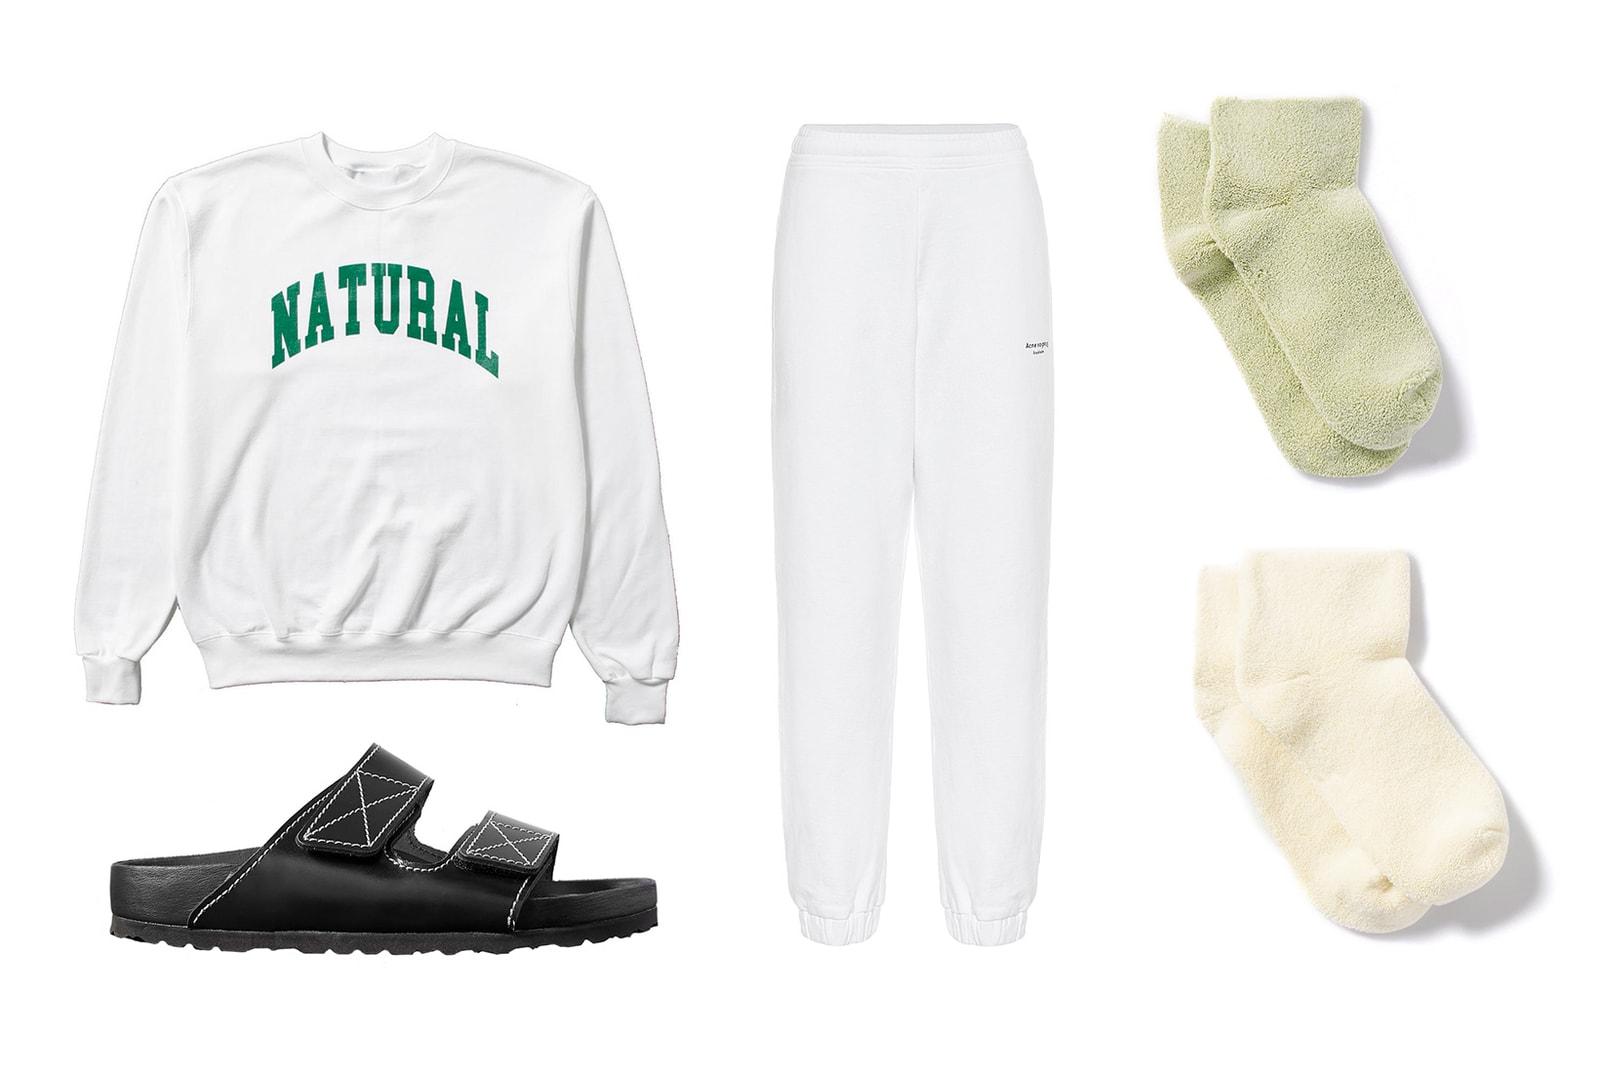 "Acne White Sweatpants Peace & Quiet ""Natural"" Sweater Proenza Schouler x Birkenstock Arizona in ""Black"" Baserange Cotton Blend Socks"